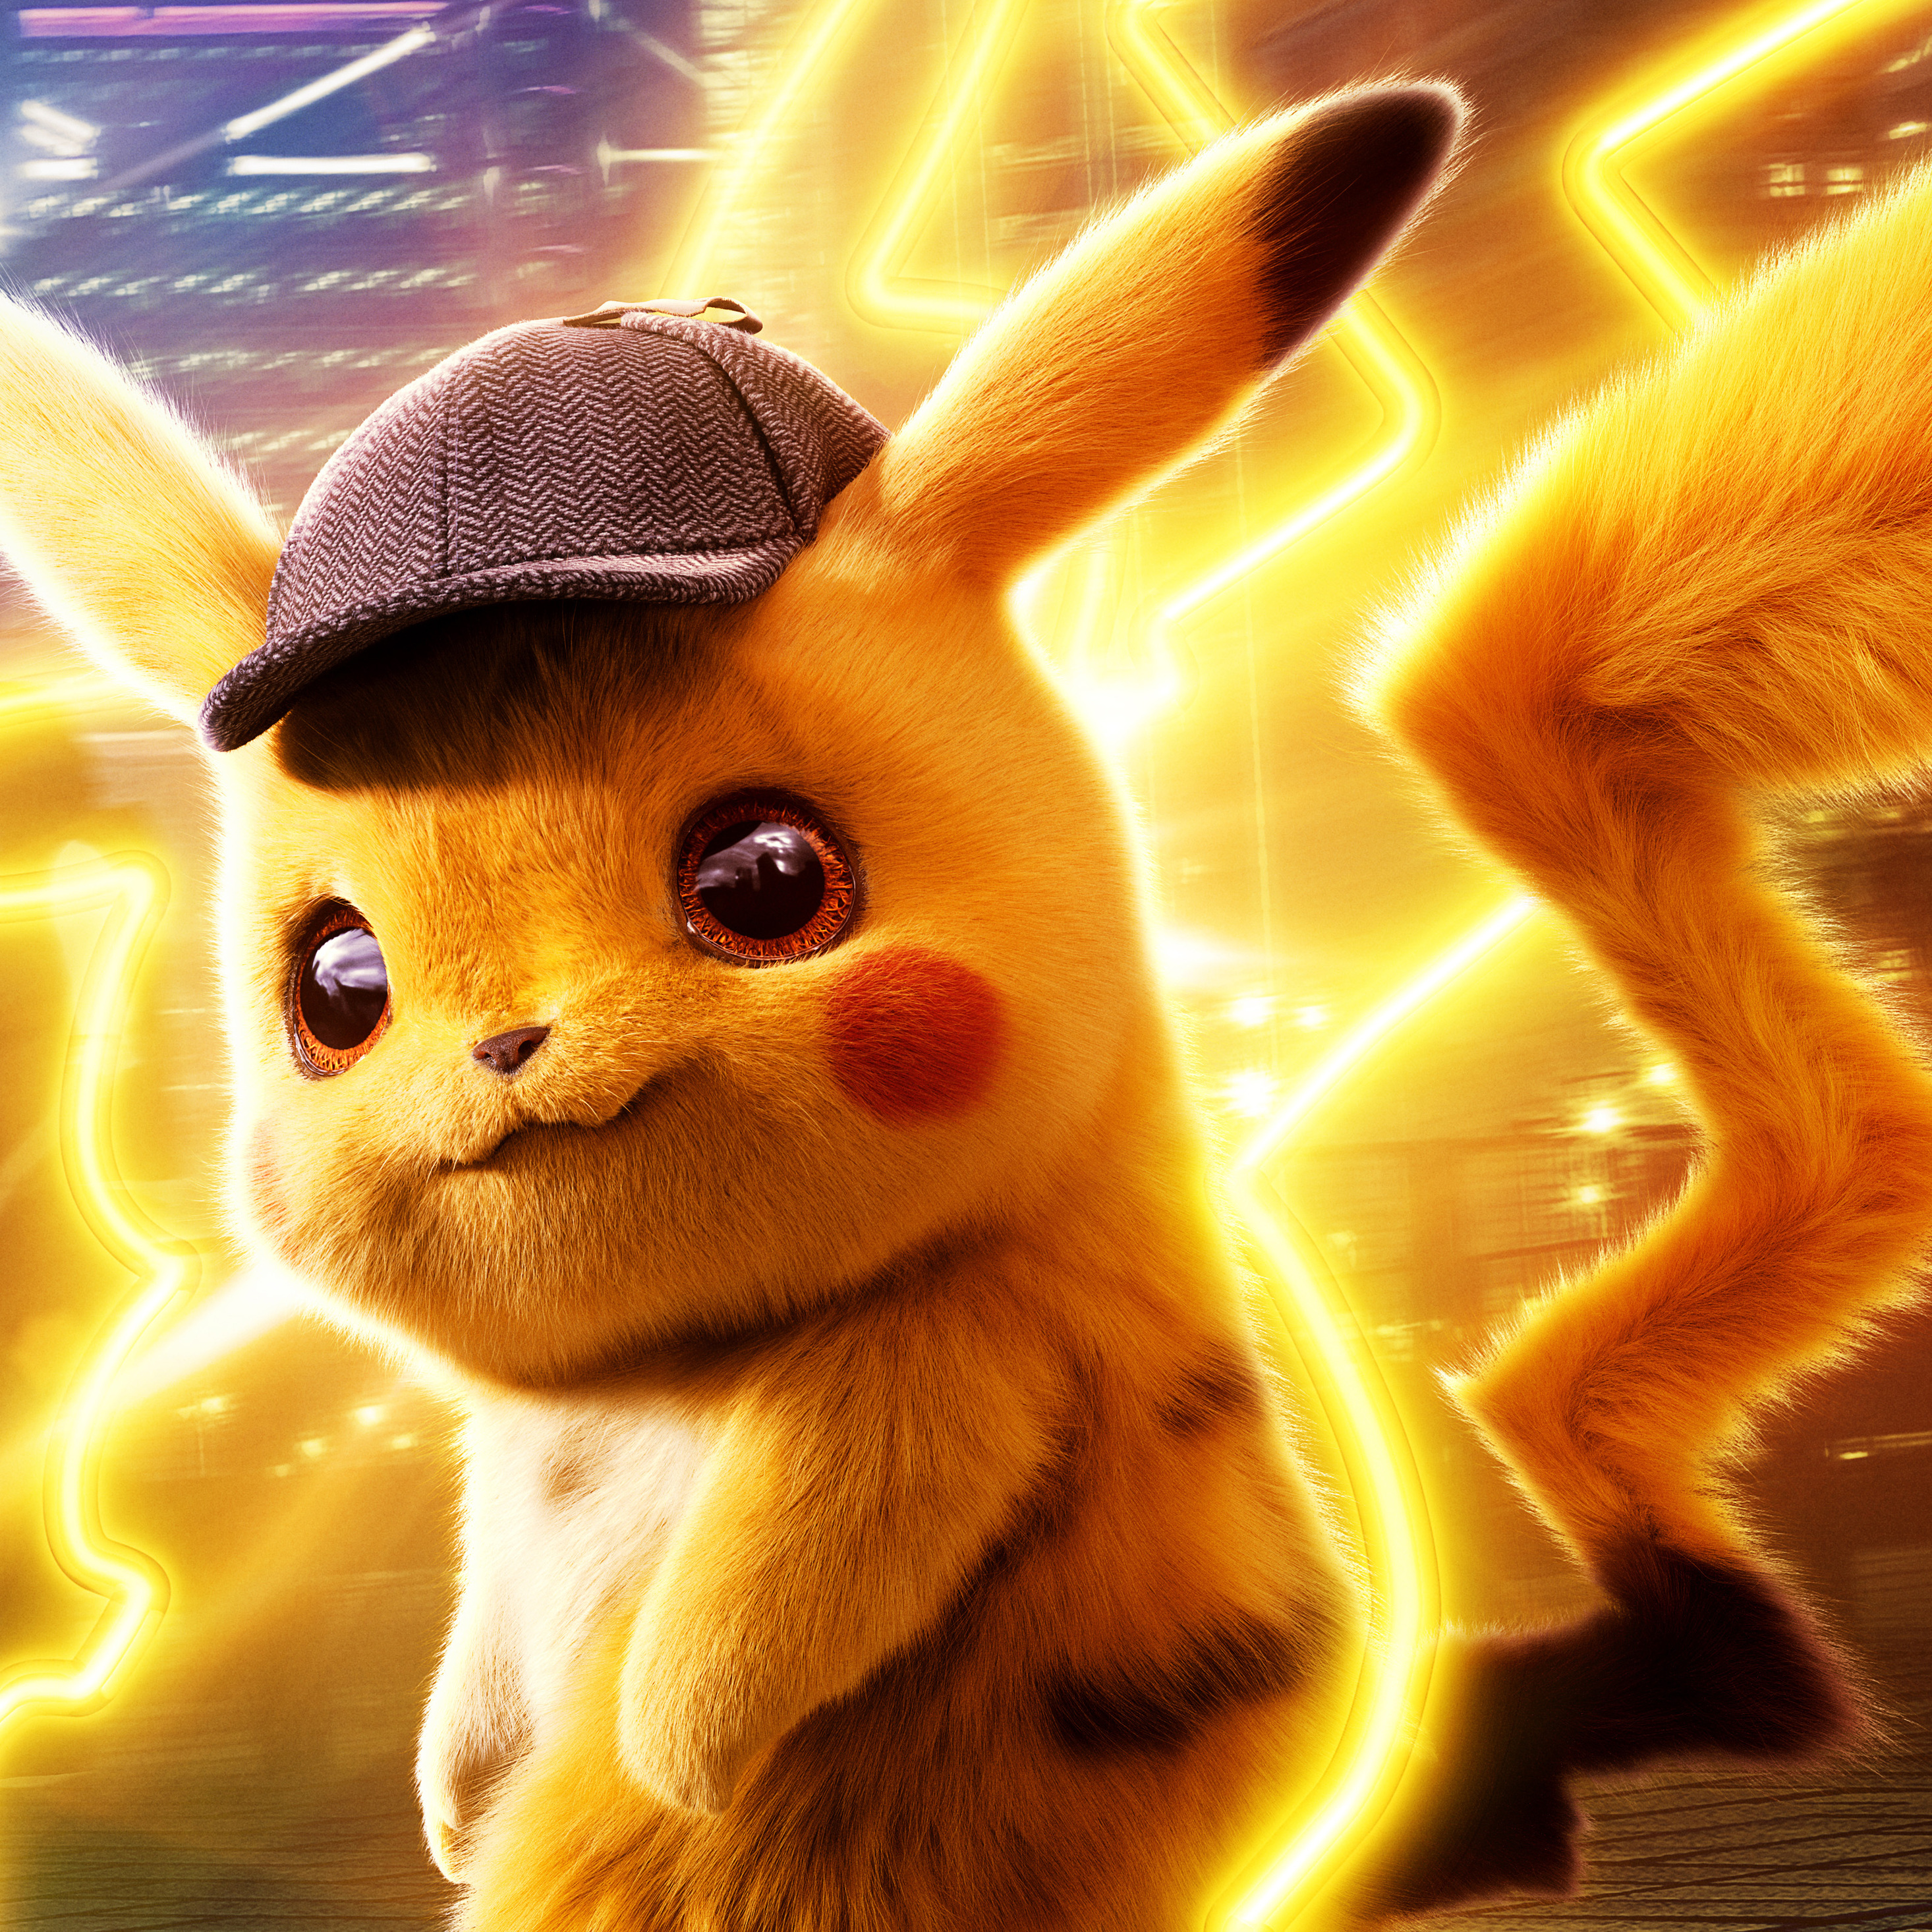 2932x2932 Pokemon Detective Pikachu 5k Ipad Pro Retina